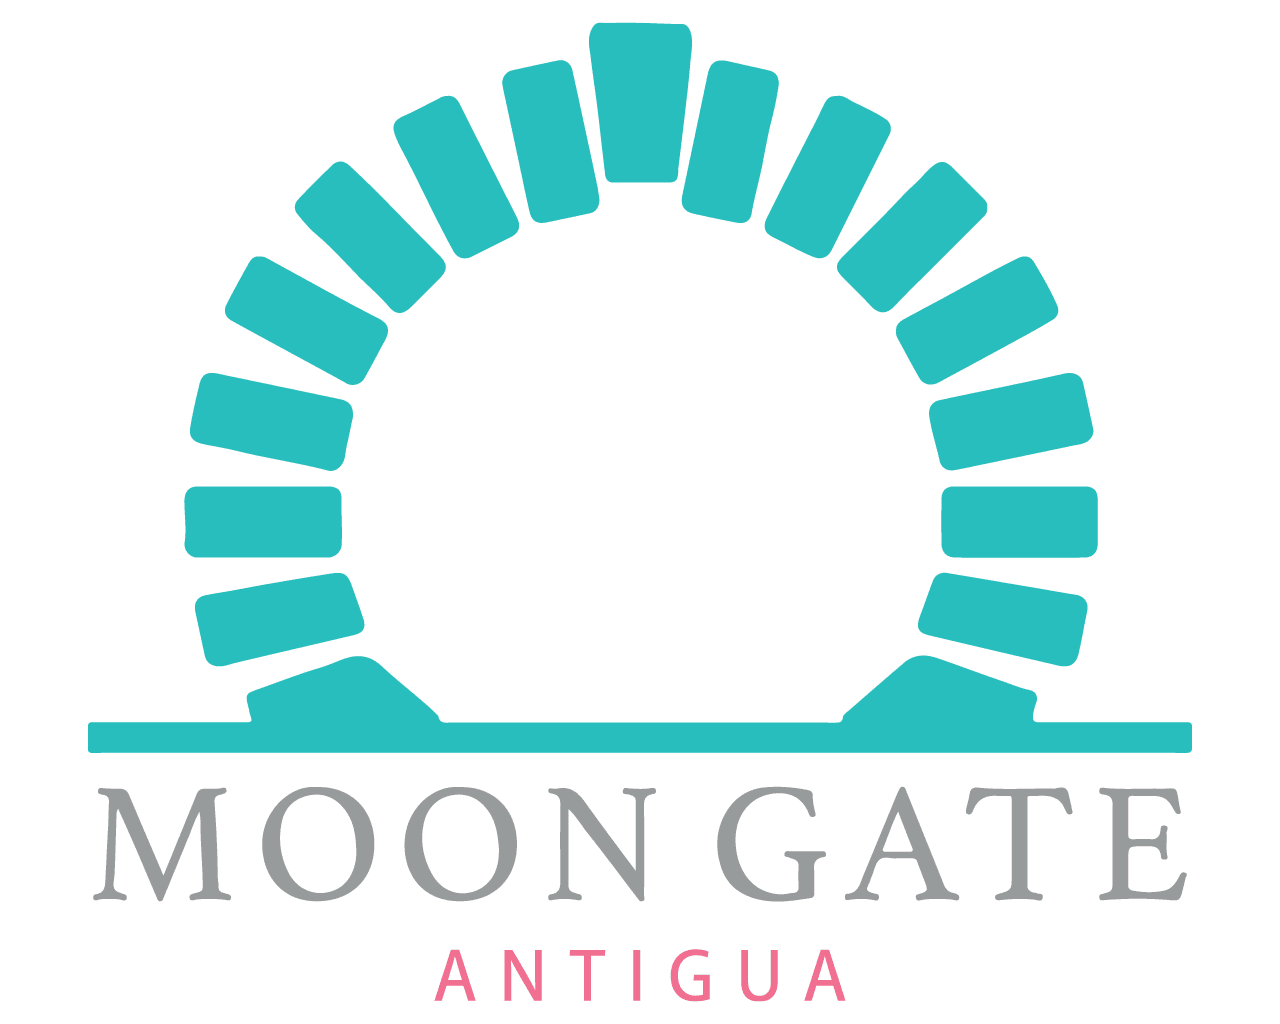 Moon Gate Antigua